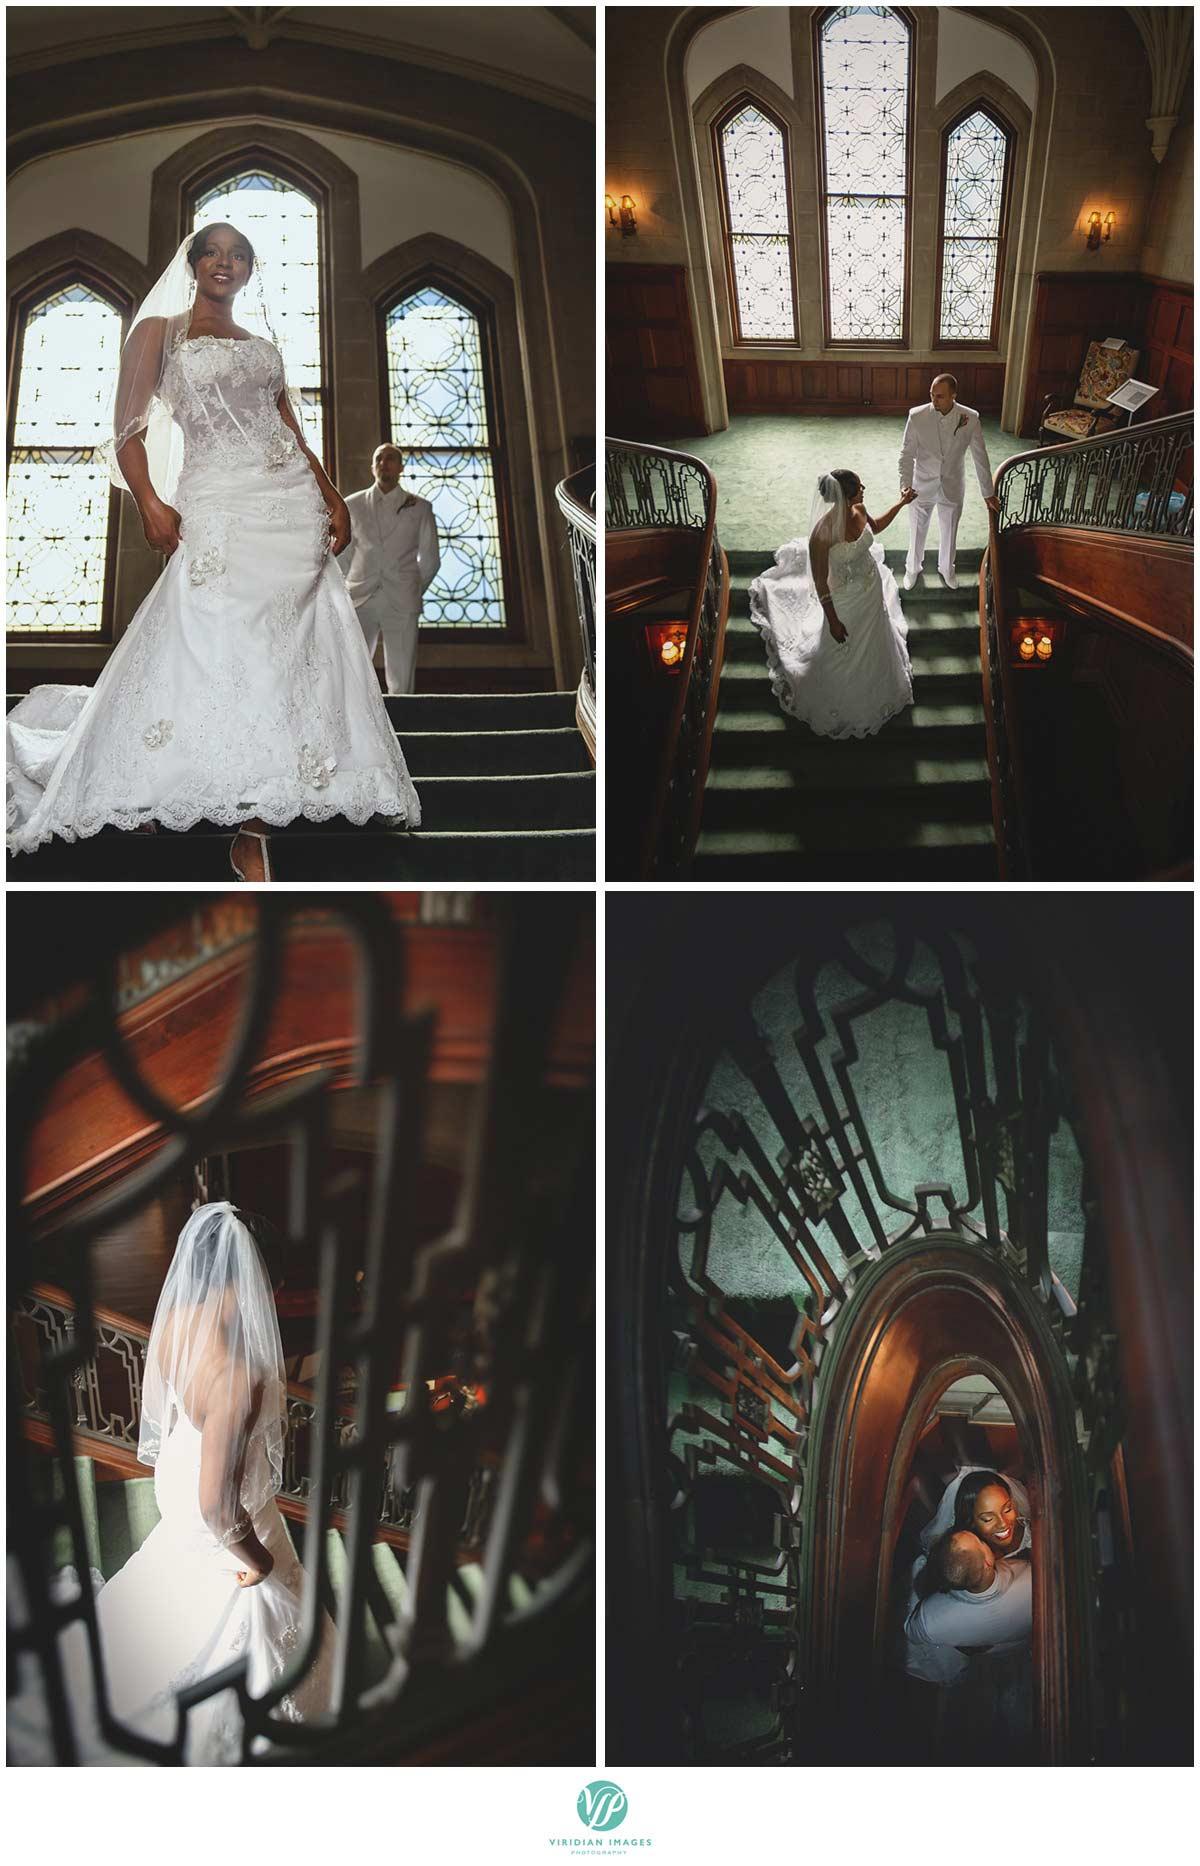 callanwolde-Atalanta-wedding-photographers-bridal-portrait-interracial-photo-16